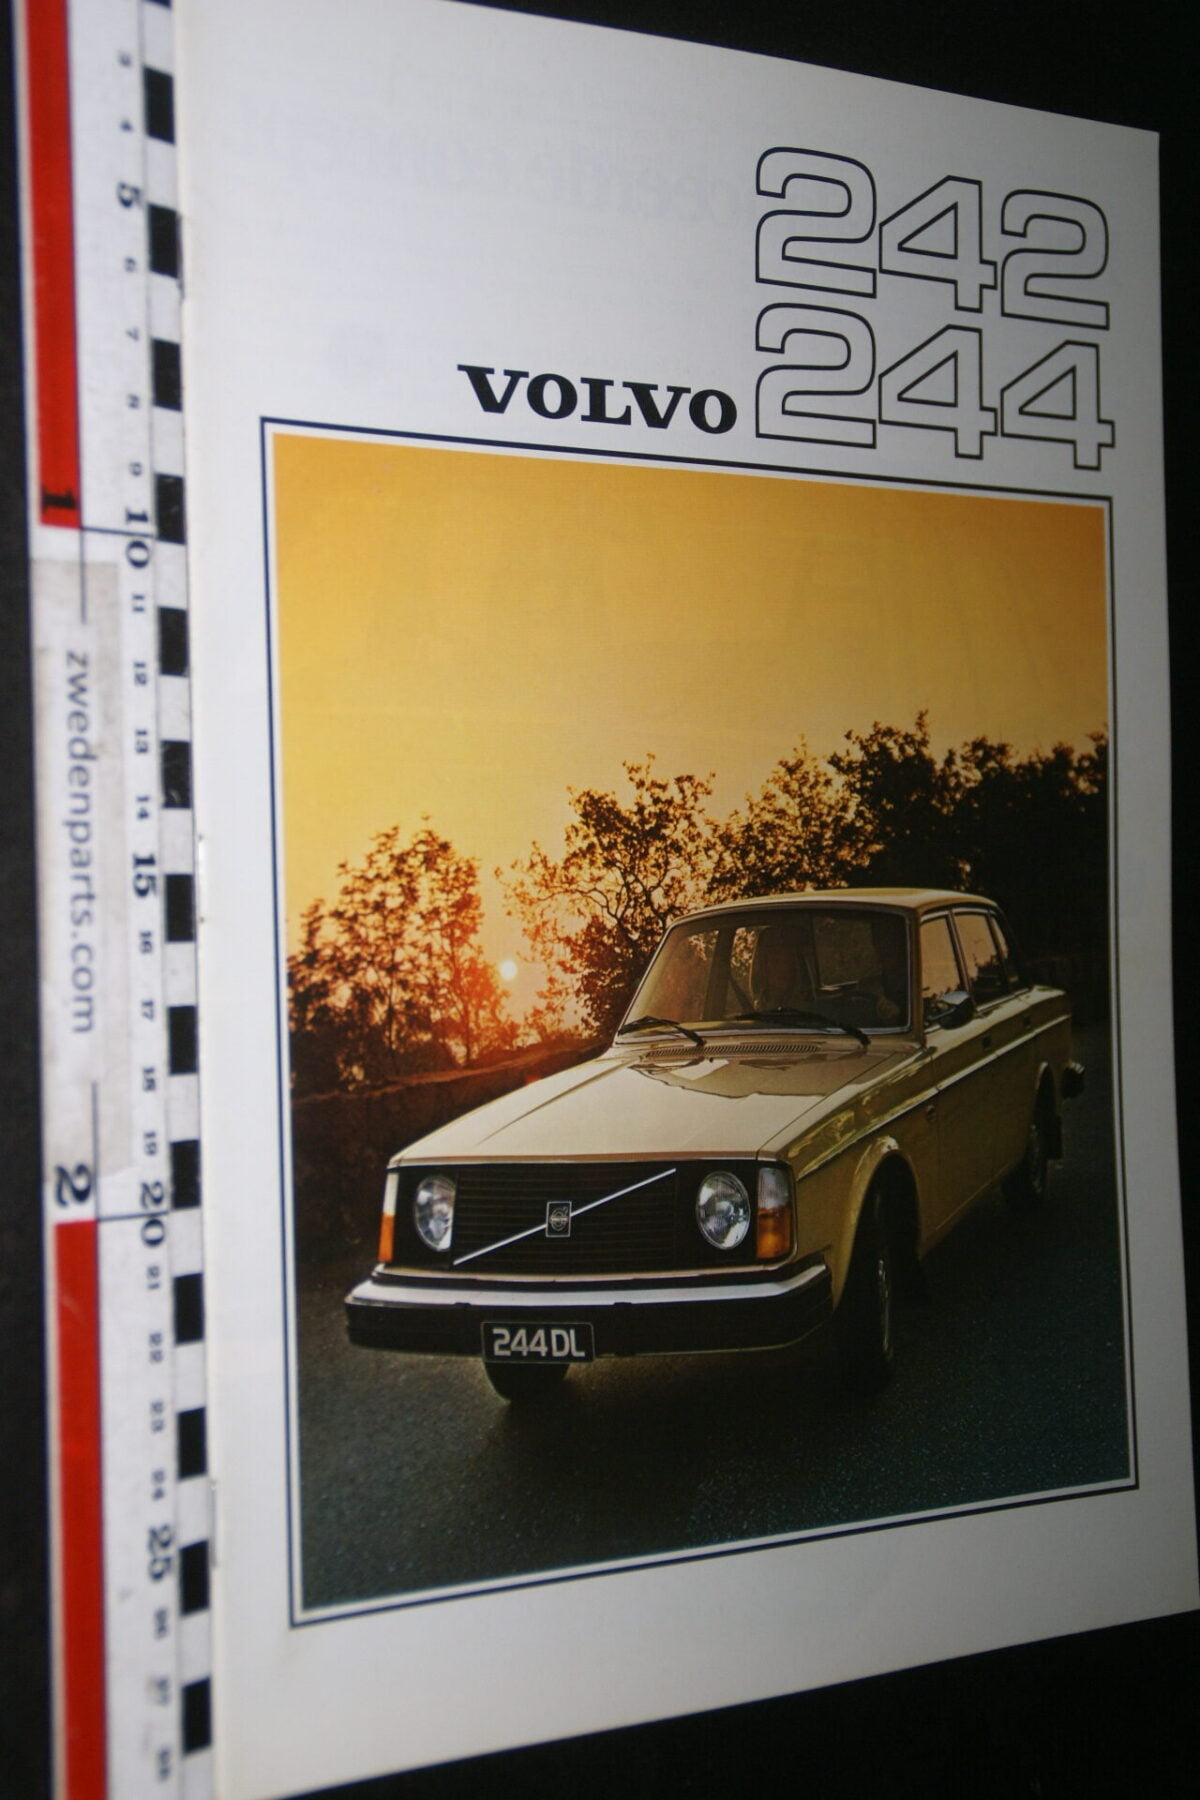 DSC07685 1976 originele brochure Volvo 242 244 nr RSPPV 2612-2-91b64a0e